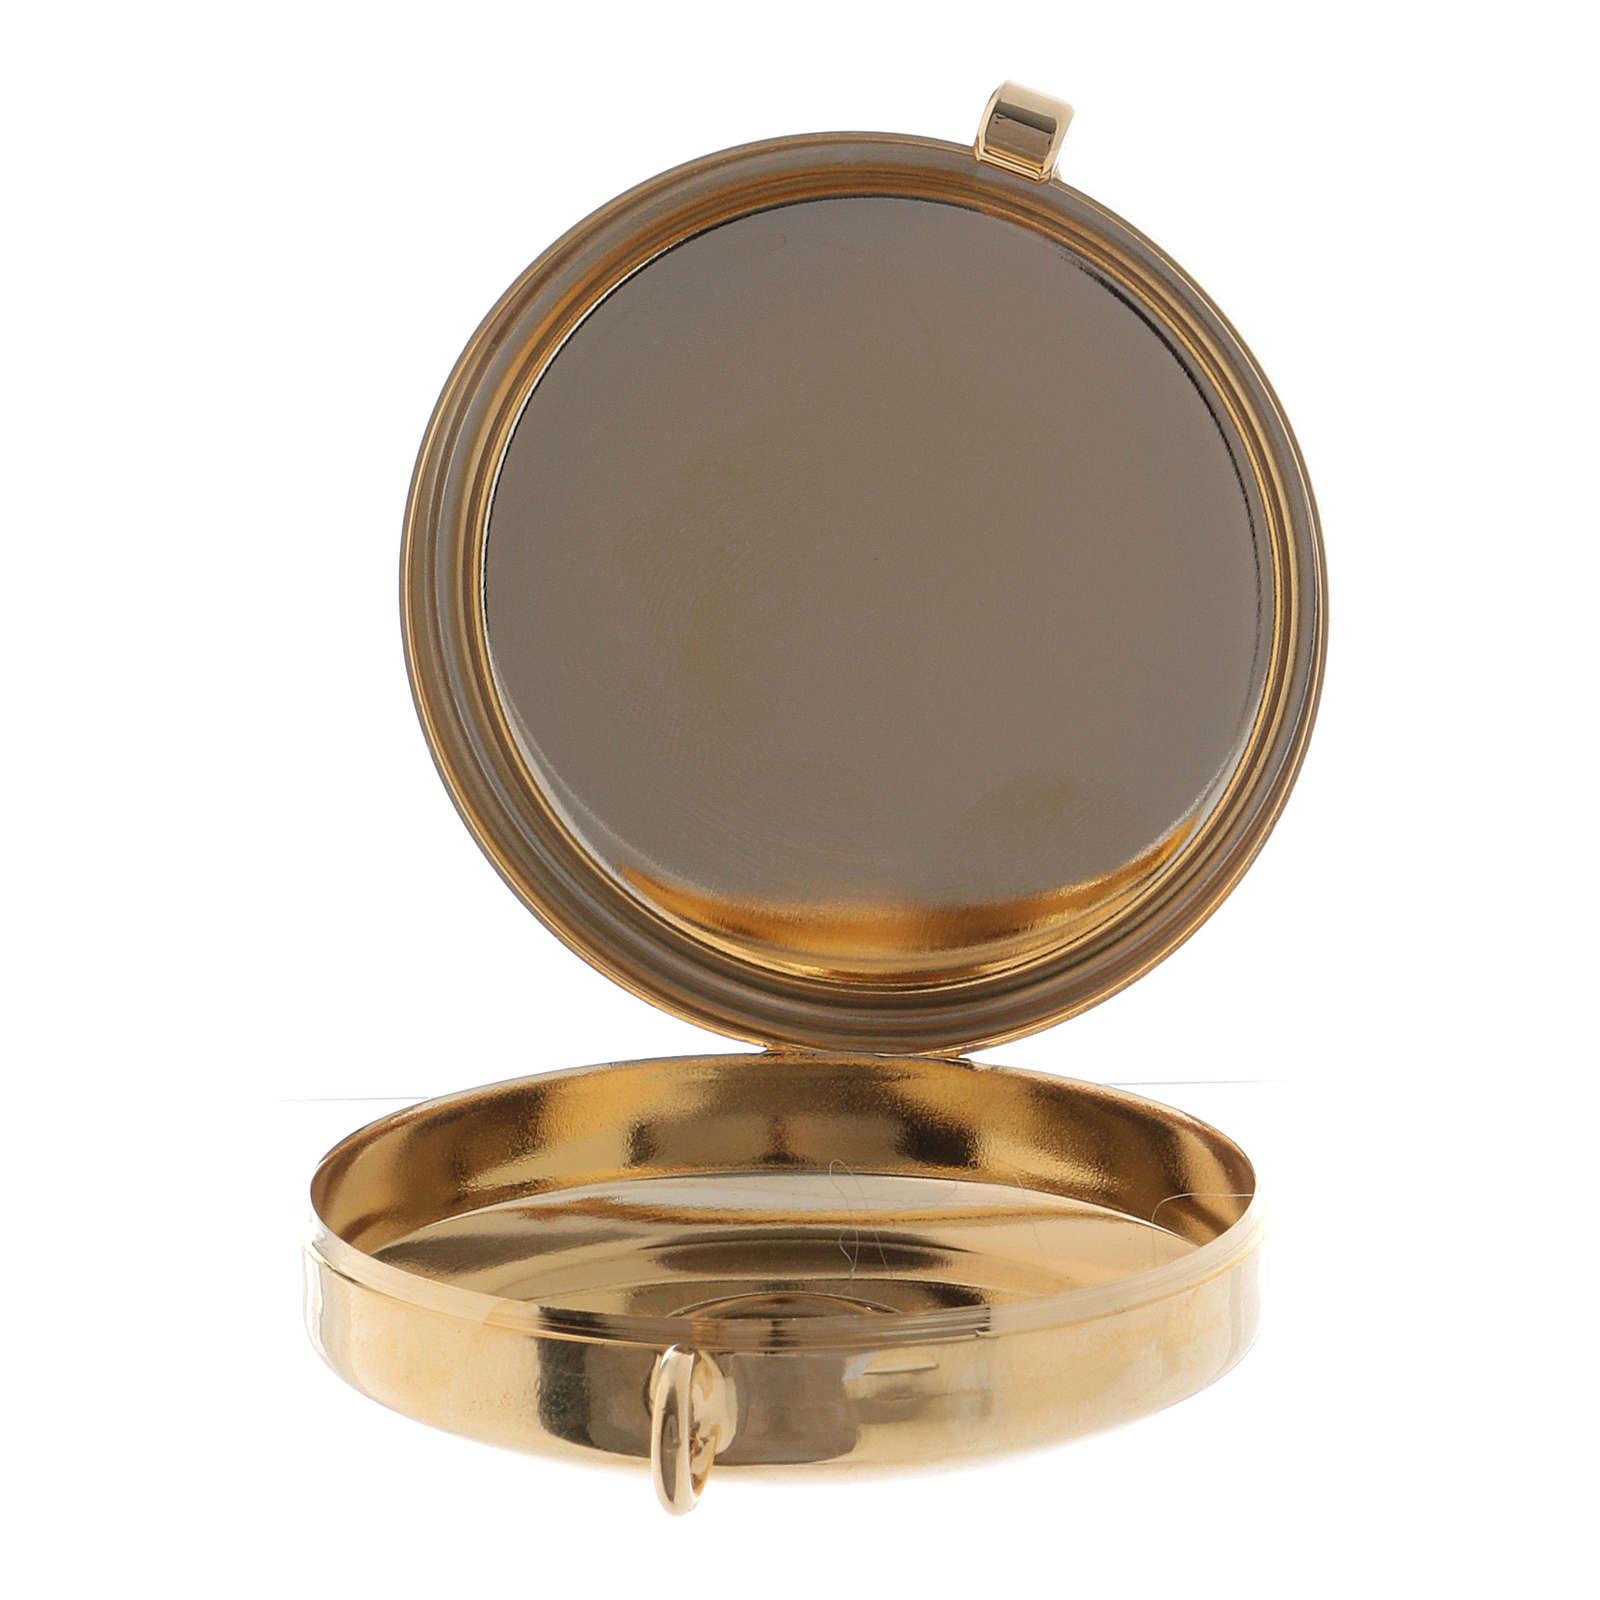 Teca porta Ostie metallo olivo inciso Calice diam. 5,5 cm 3